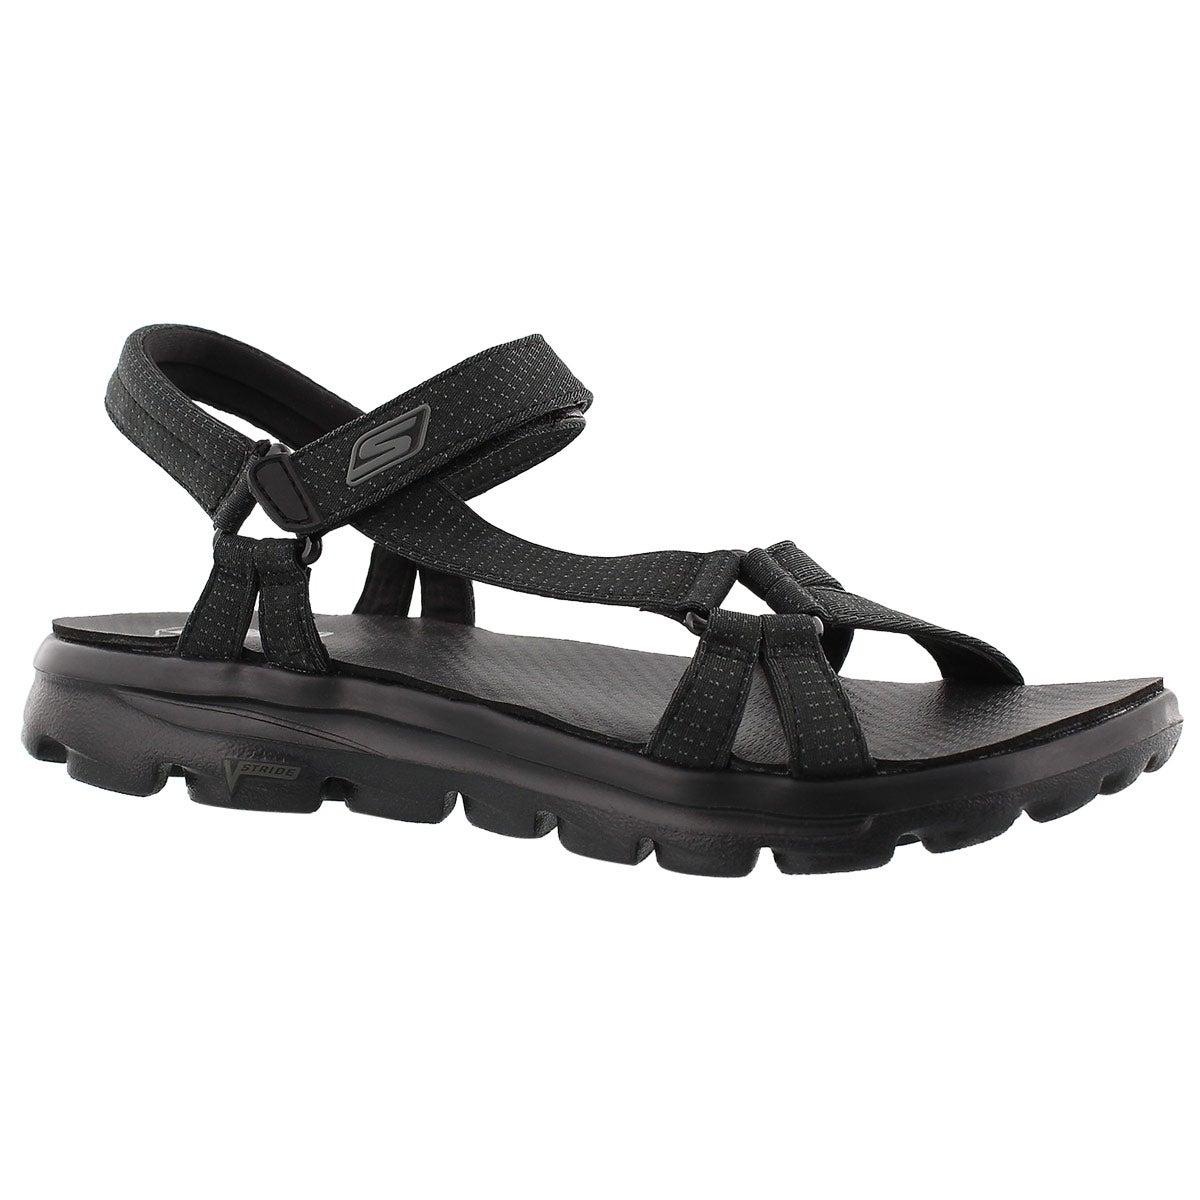 Lds River Walk black sport sandal